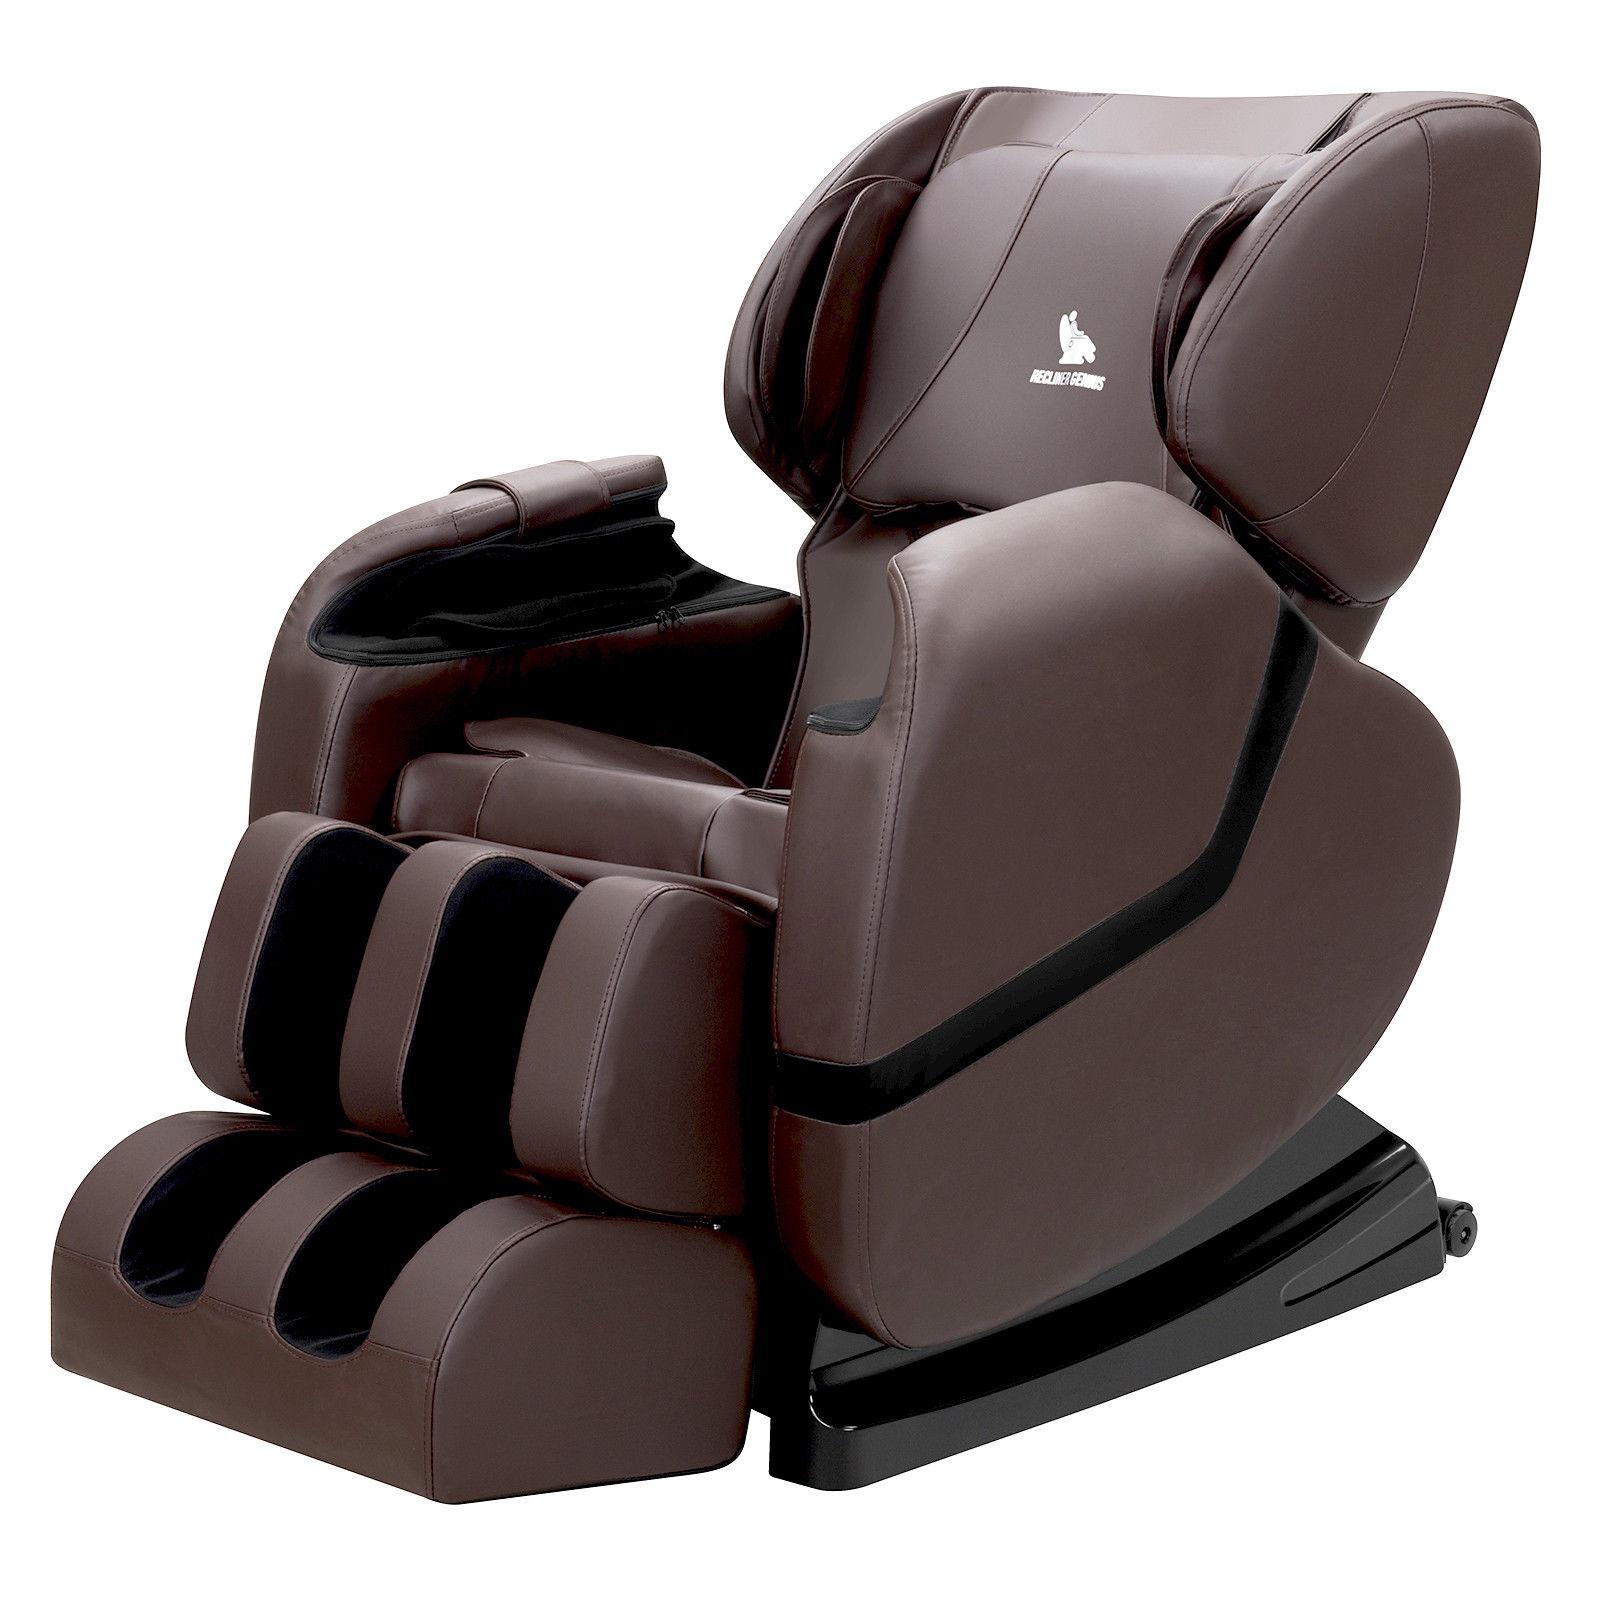 Zero Gravity Shiatsu Full Body Massage Chair Recliner with Heat and Foot Rest